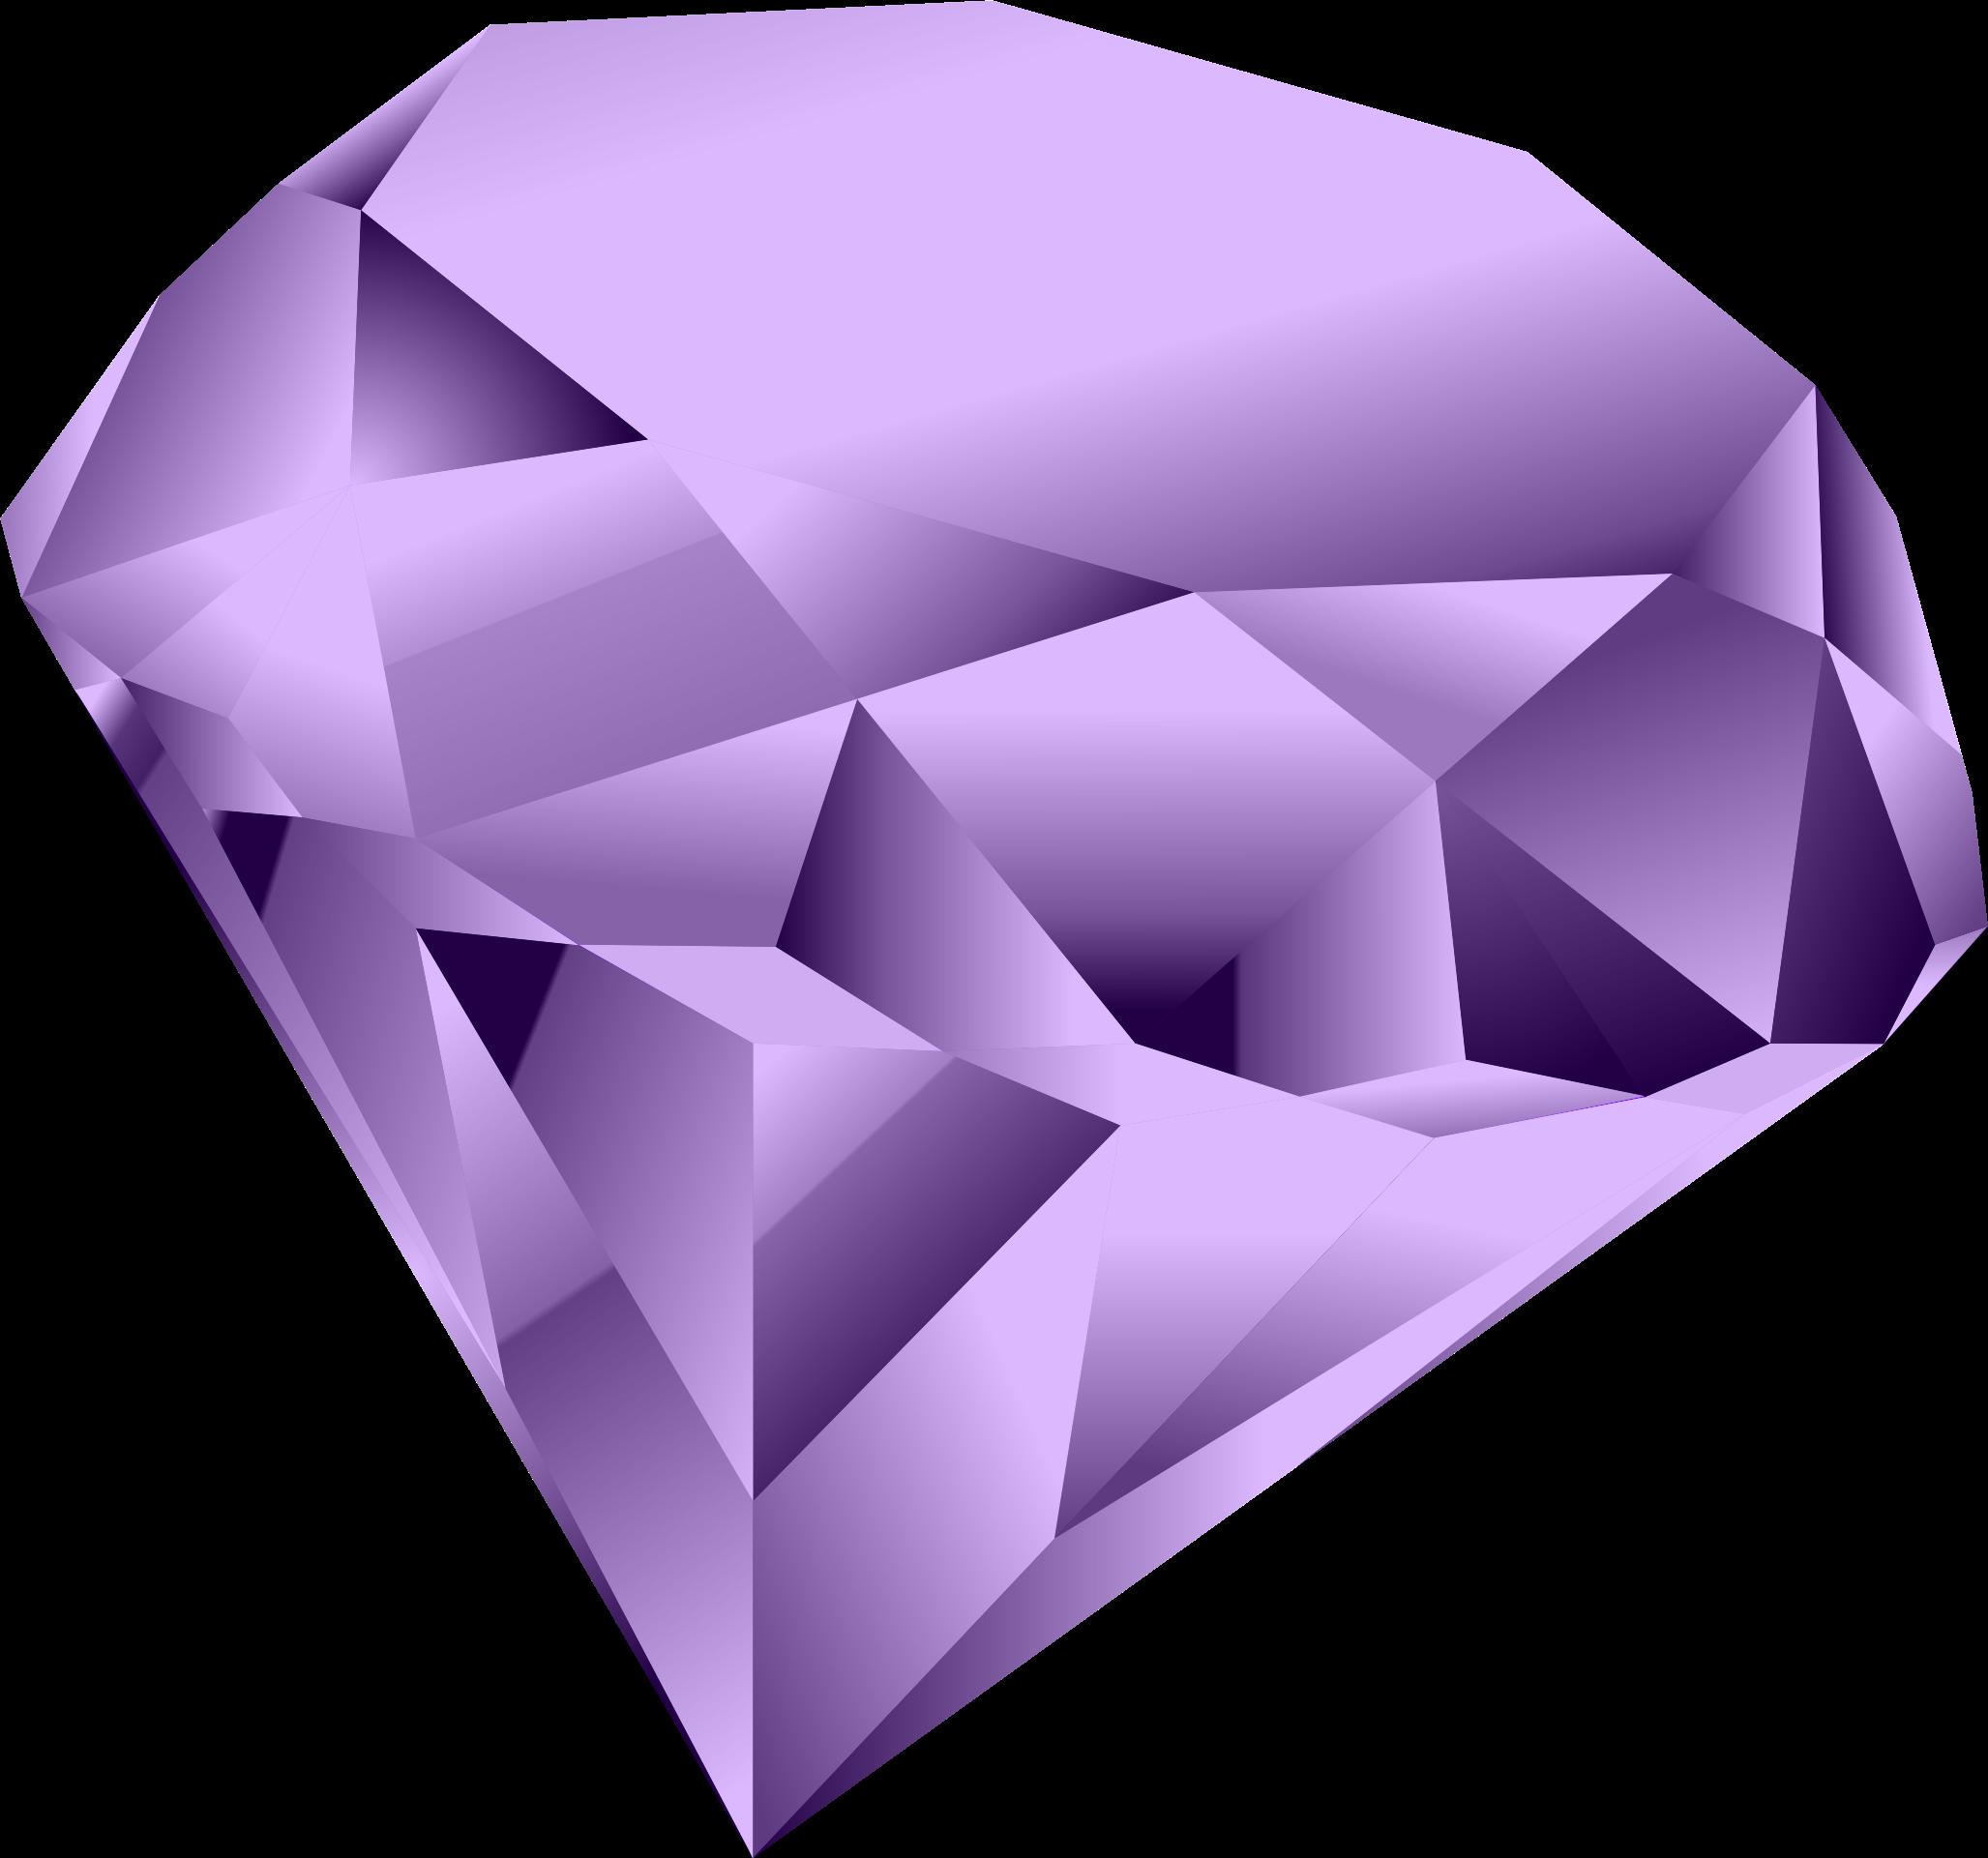 Gems clipart purple diamond 3 diamond Clipart 3 diamond